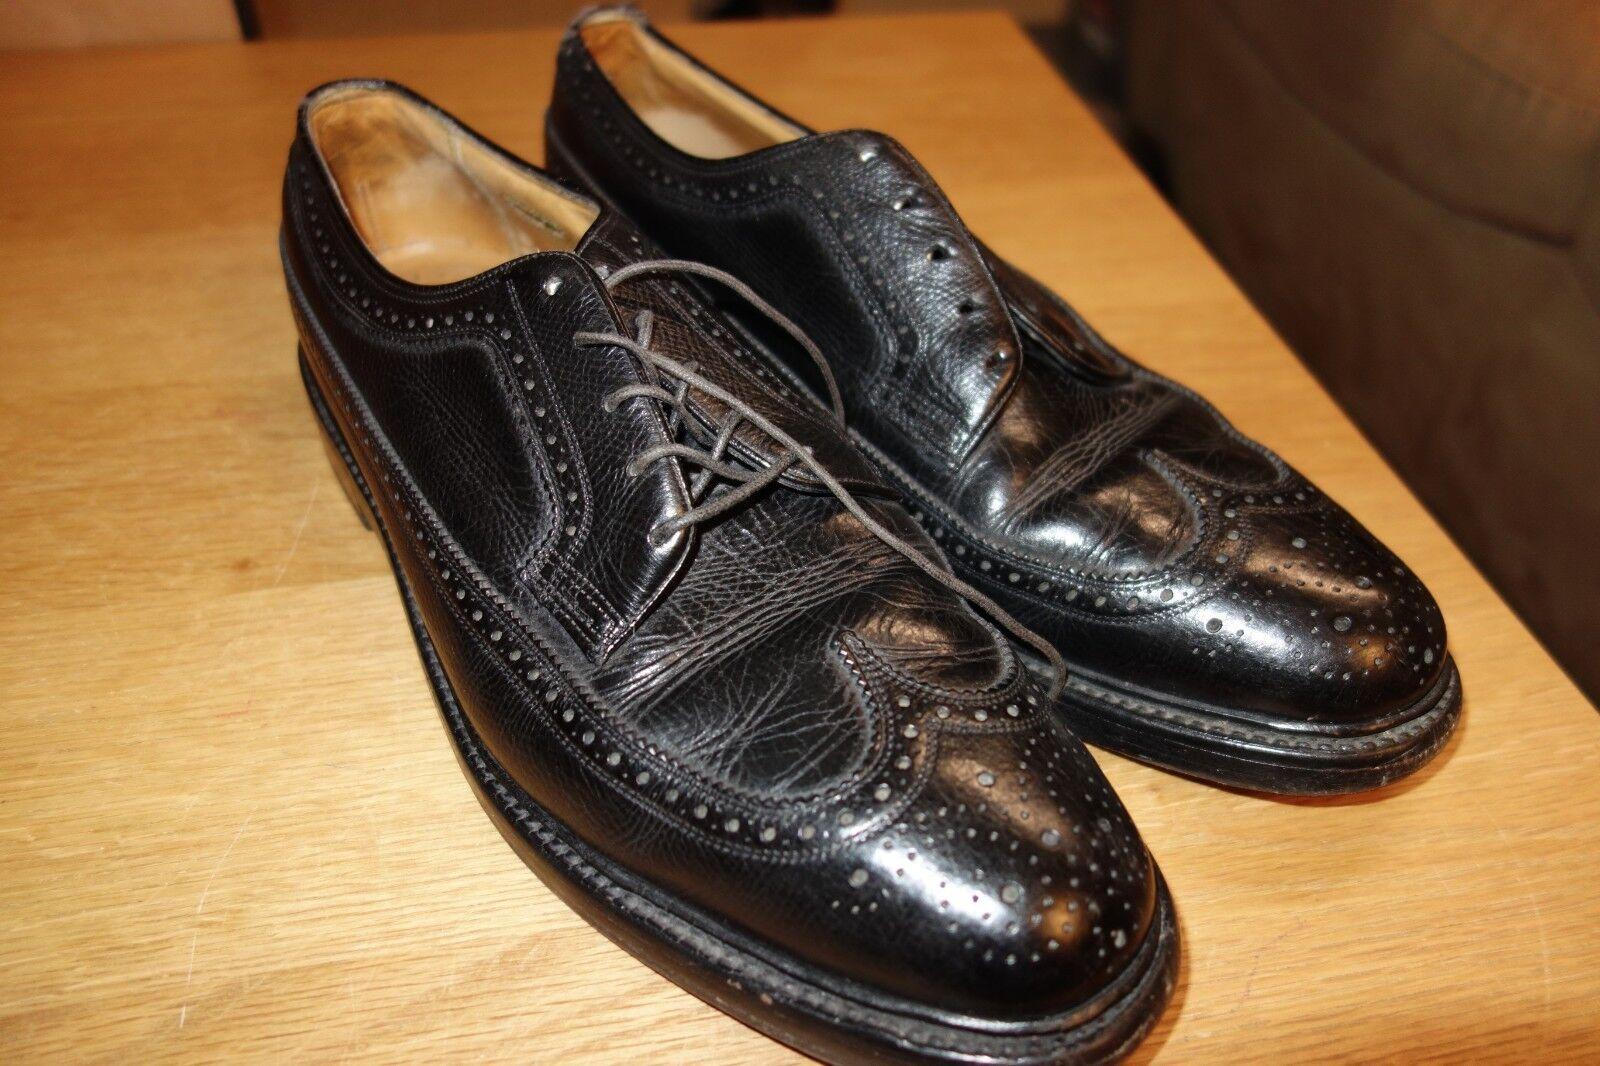 Florsheim Imperial 5 Uñas Negro granulada de punta del ala Oxfords C Usa